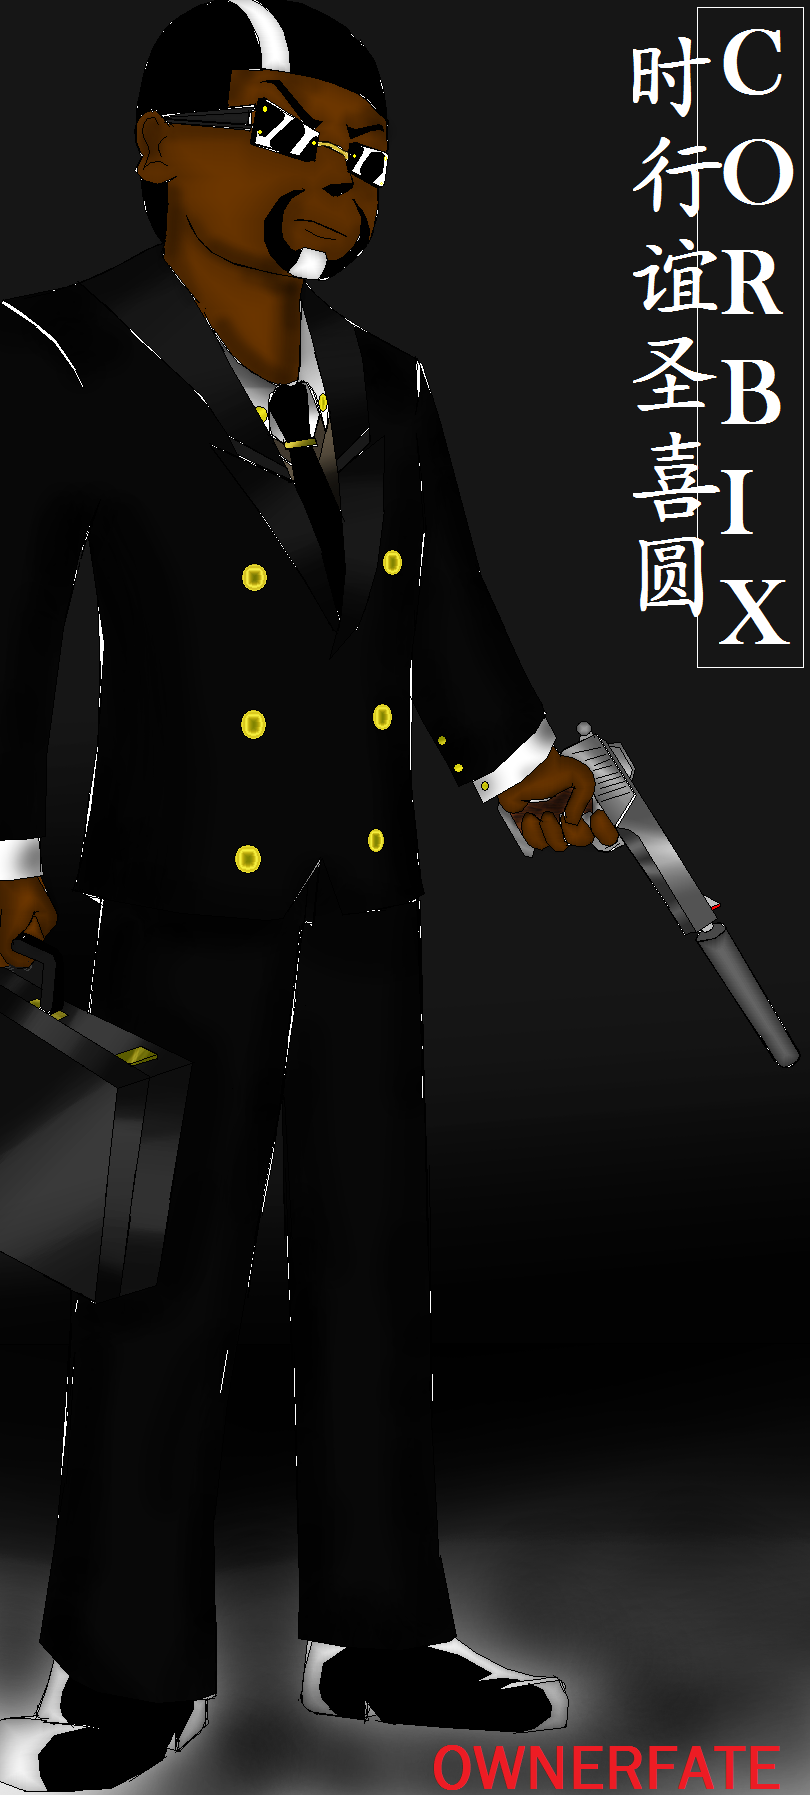 ownerfate's Profile Picture